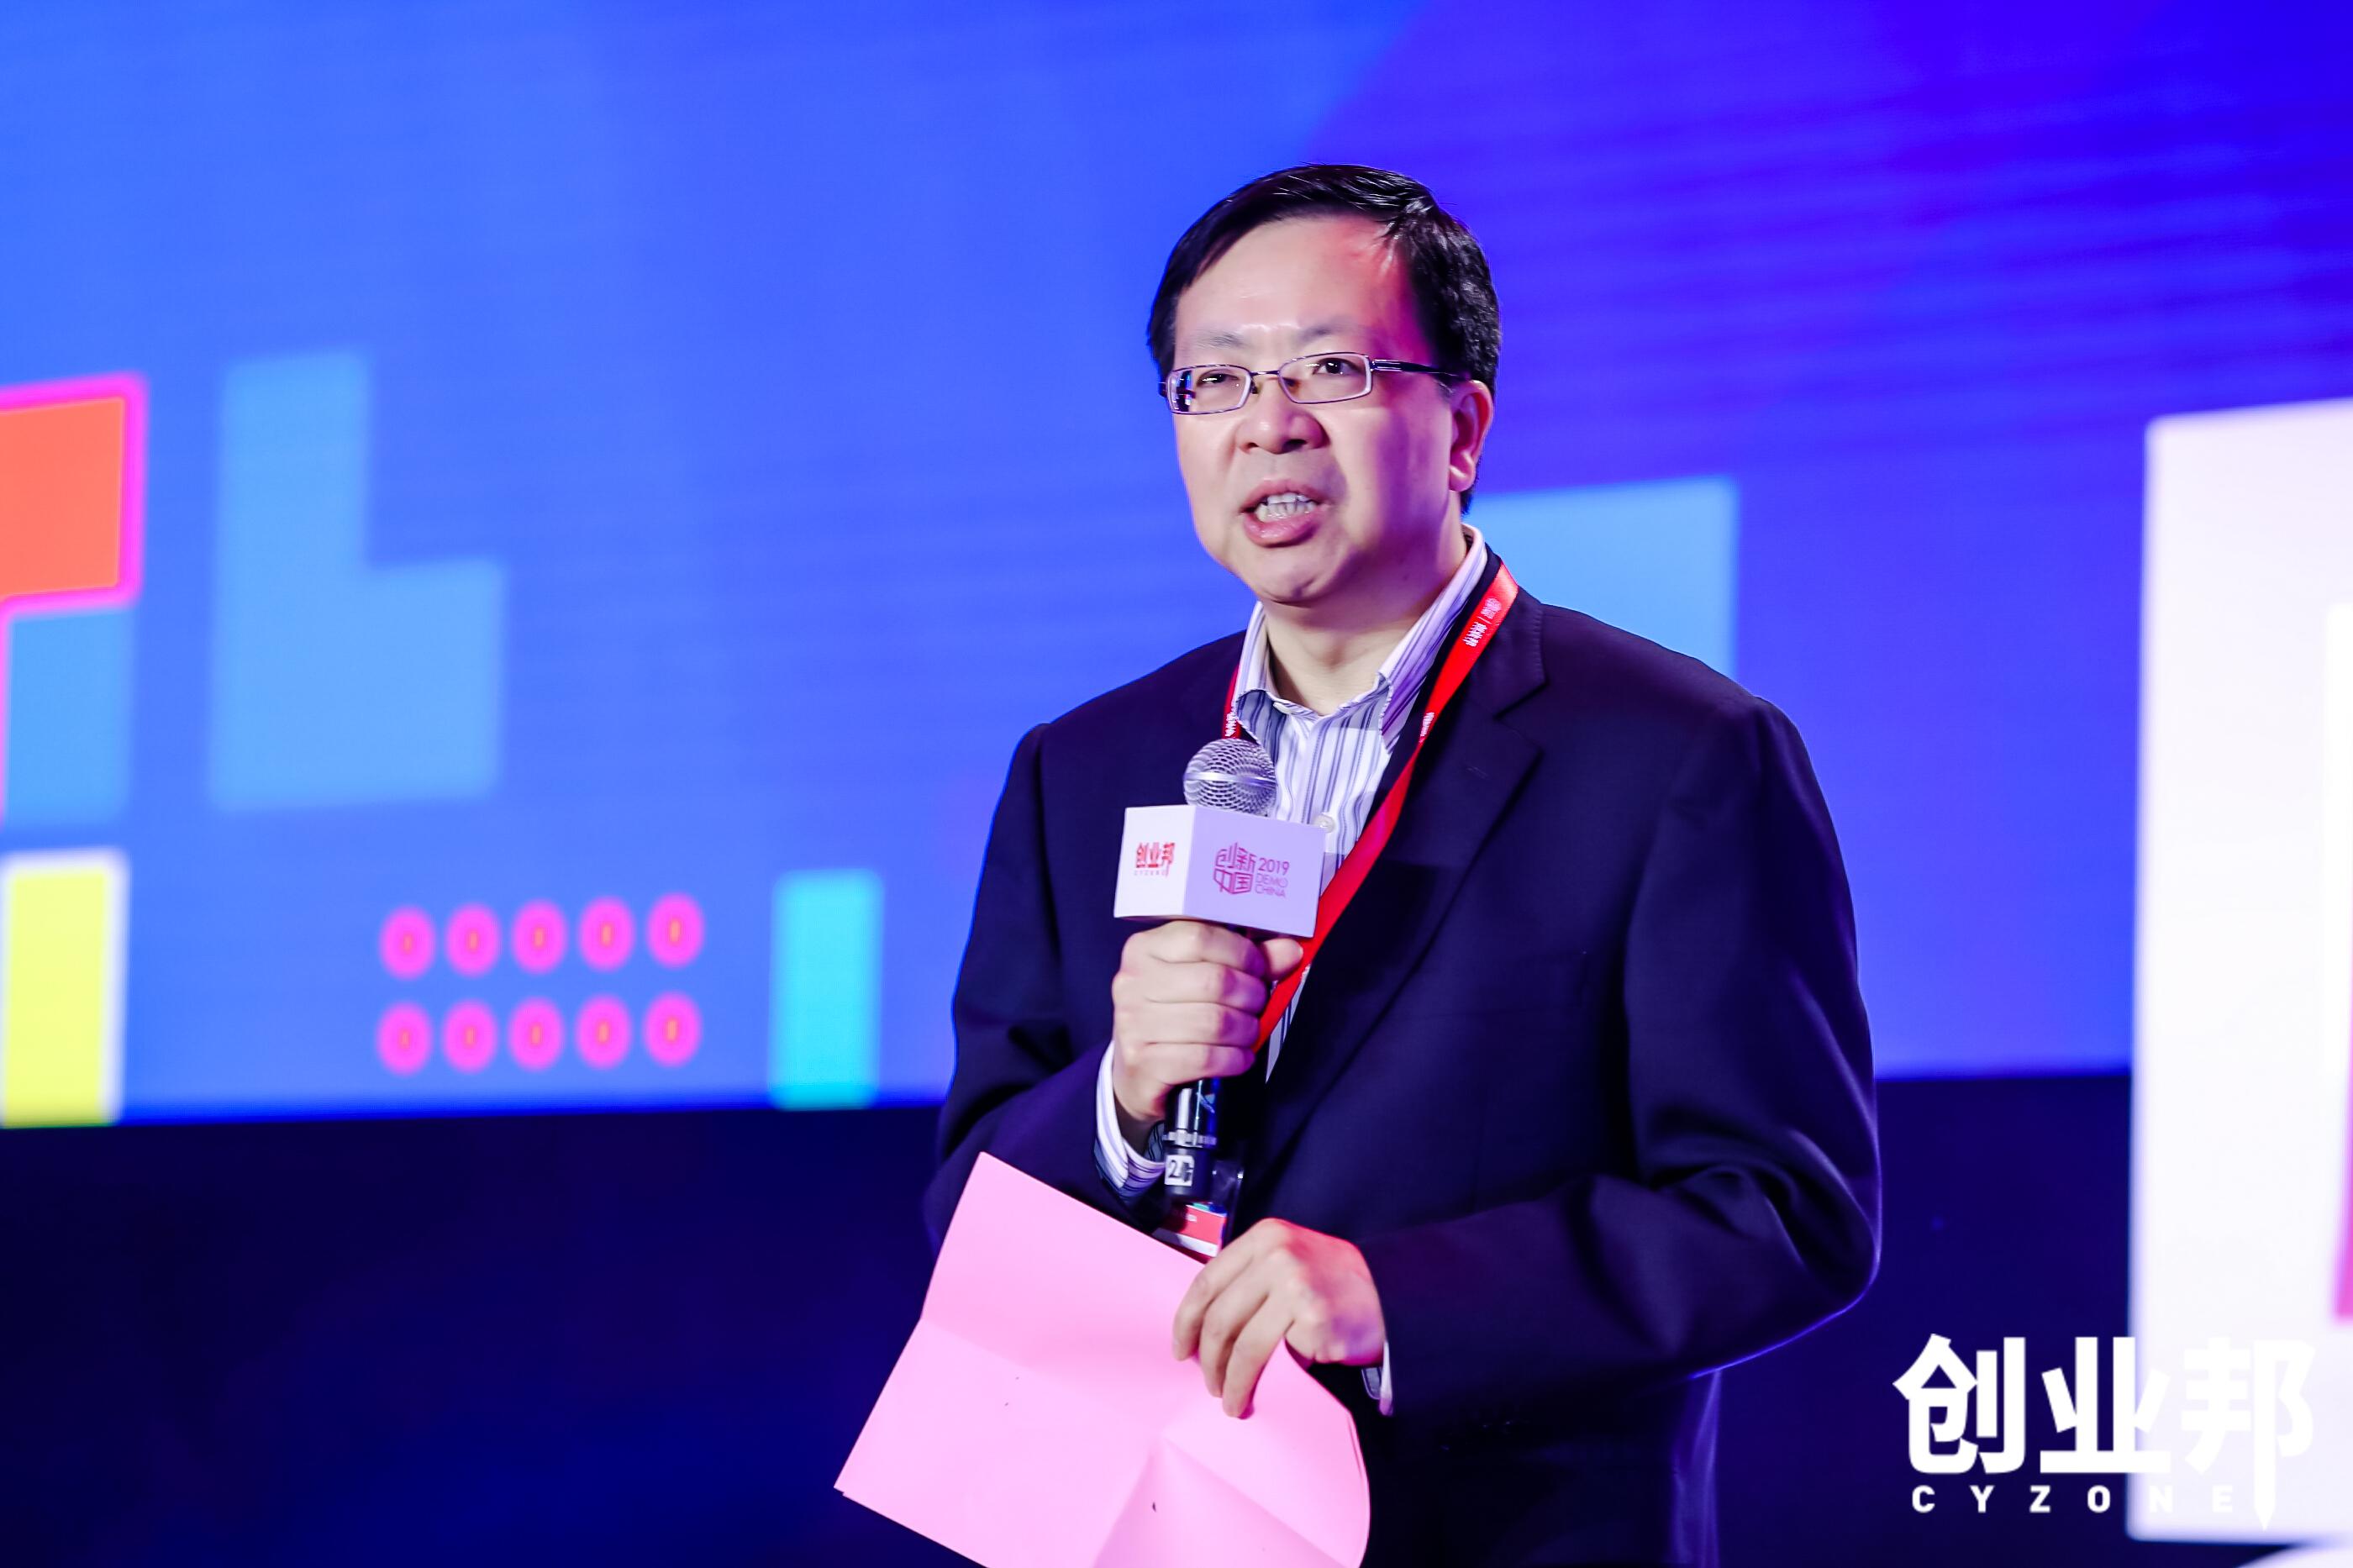 """2019 Demo China创新中国春季峰会""在上海隆重举行"